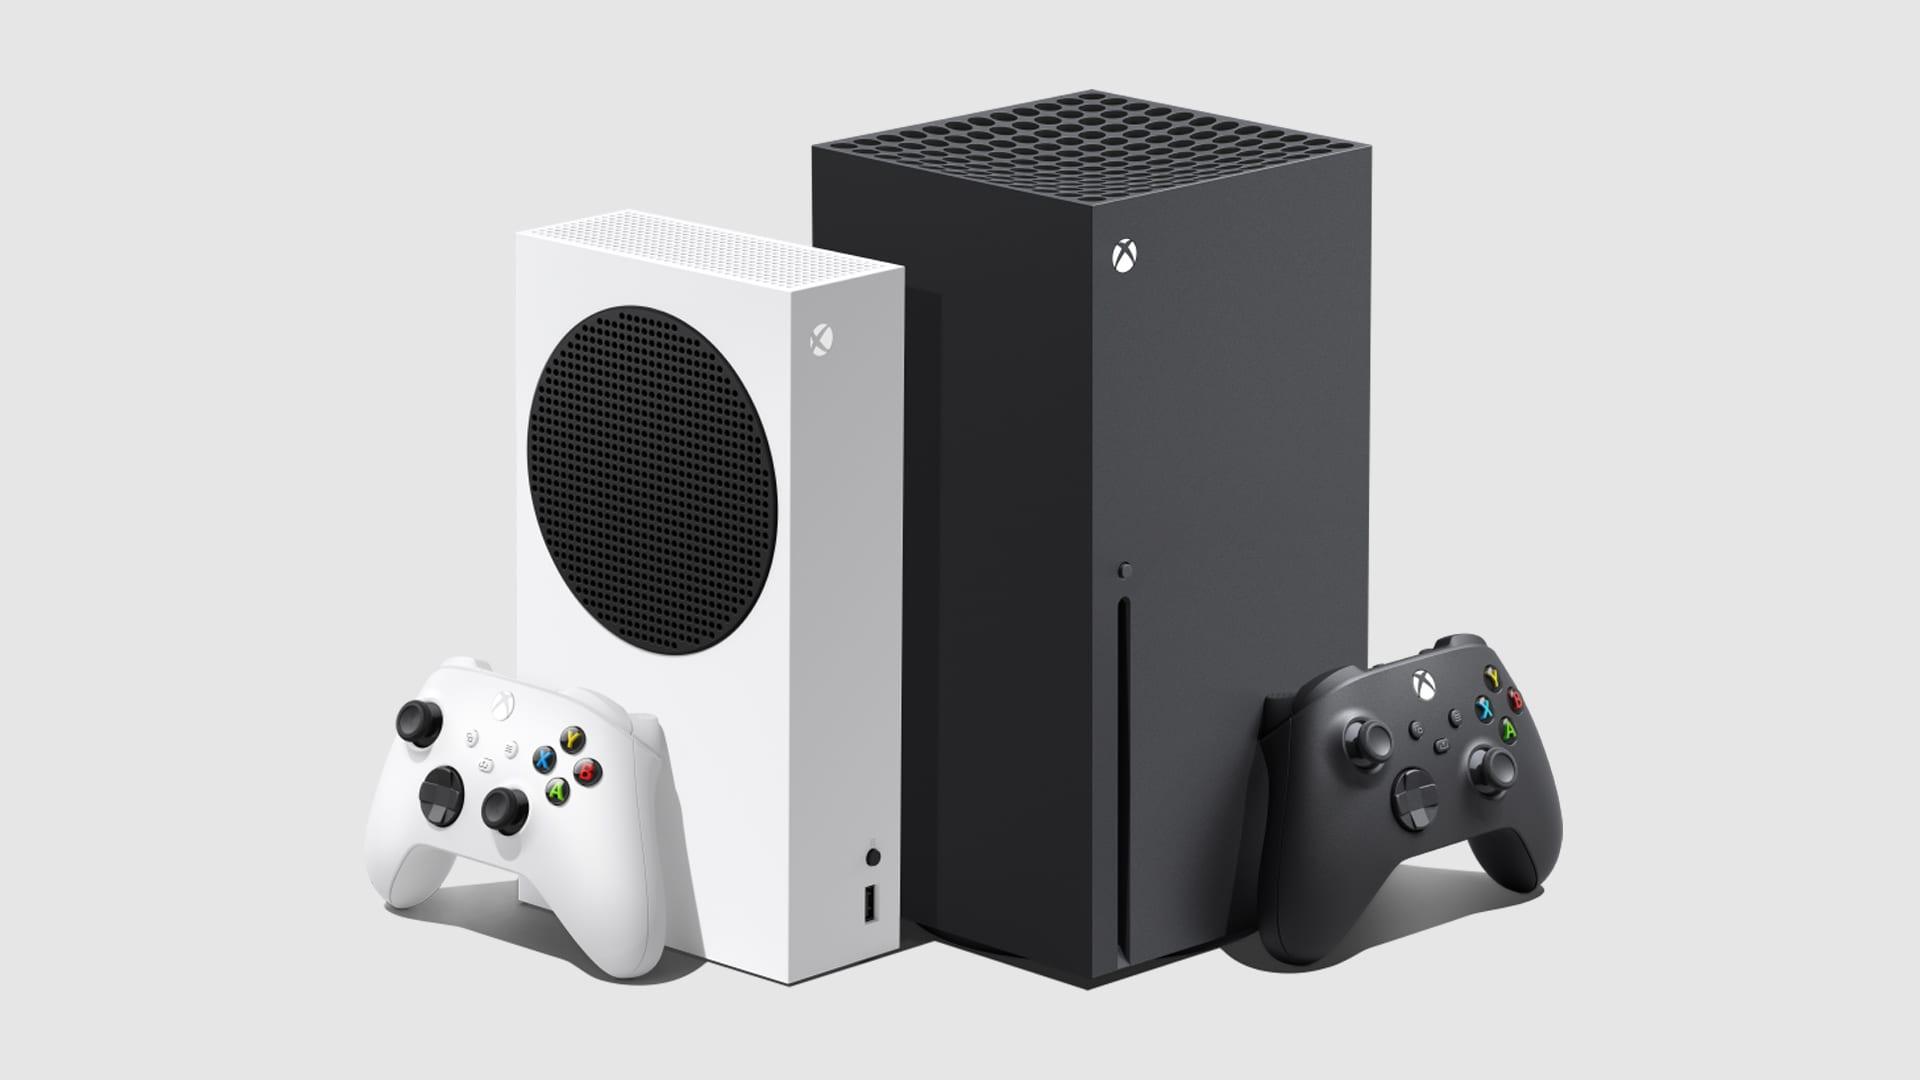 xbox series X, Xbox series S, update games